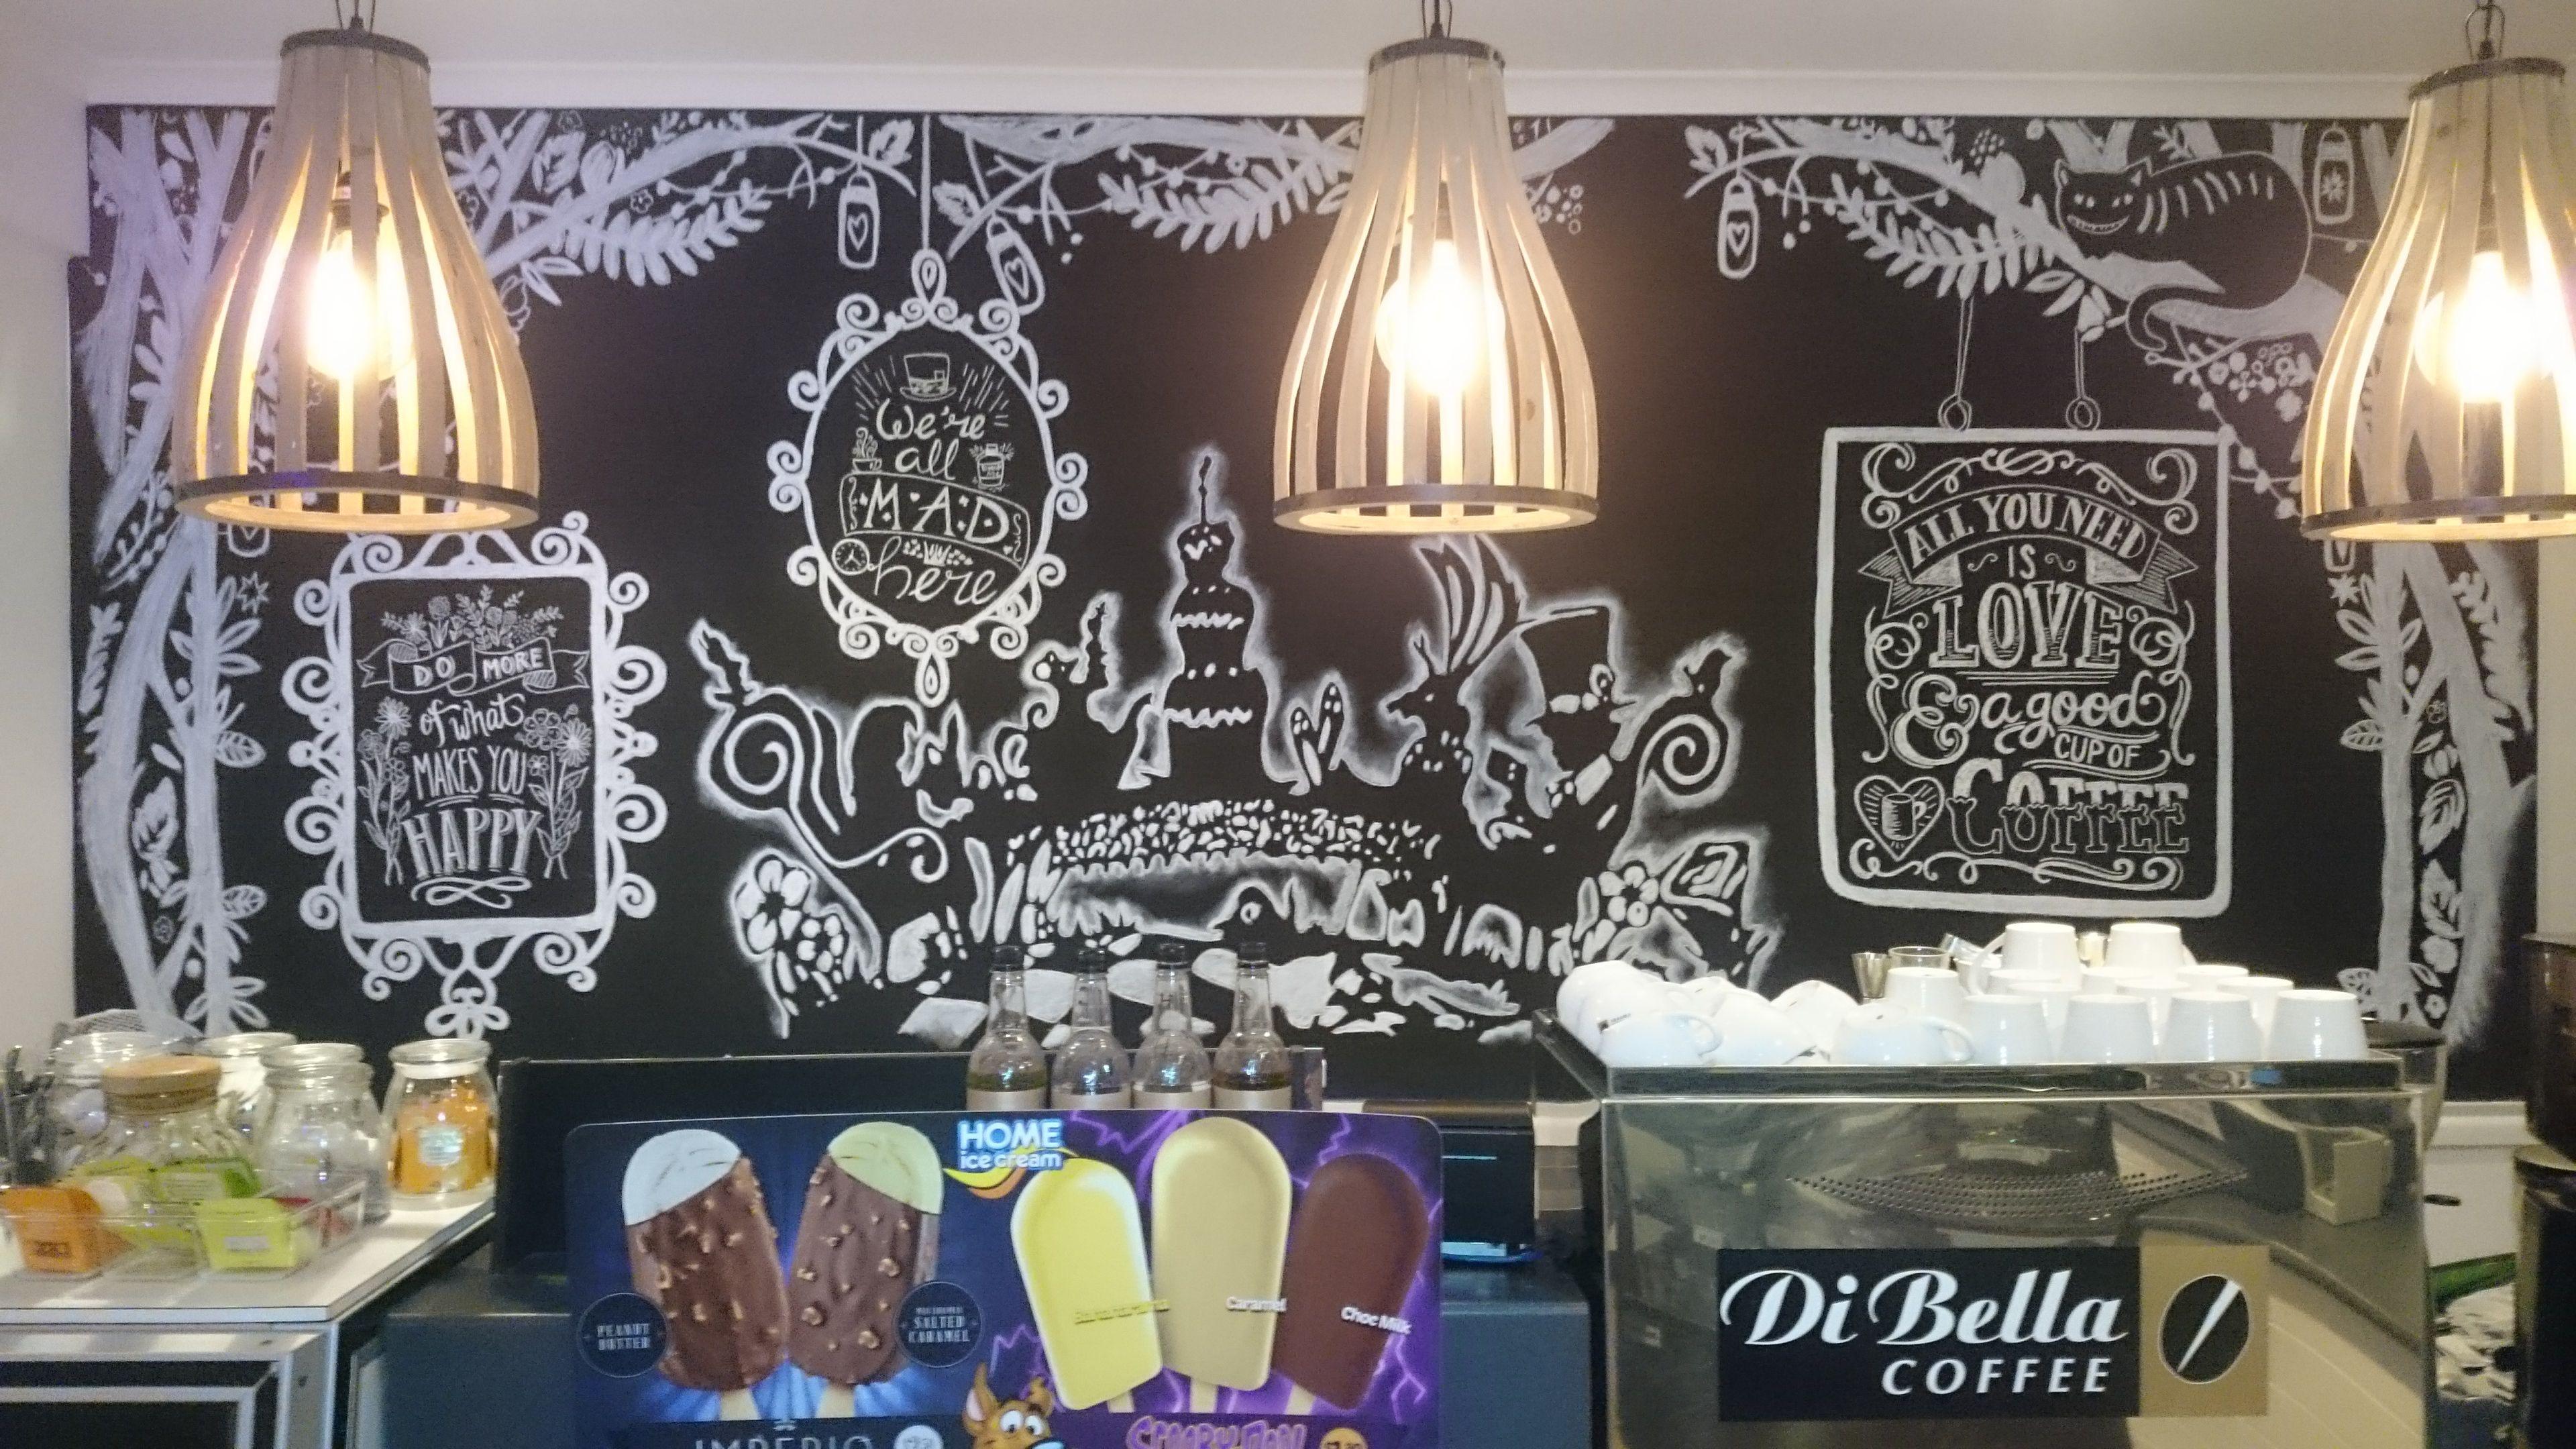 Alice in Wonderland inspired chalk wall mural for Tiddlywinks in Nundah.